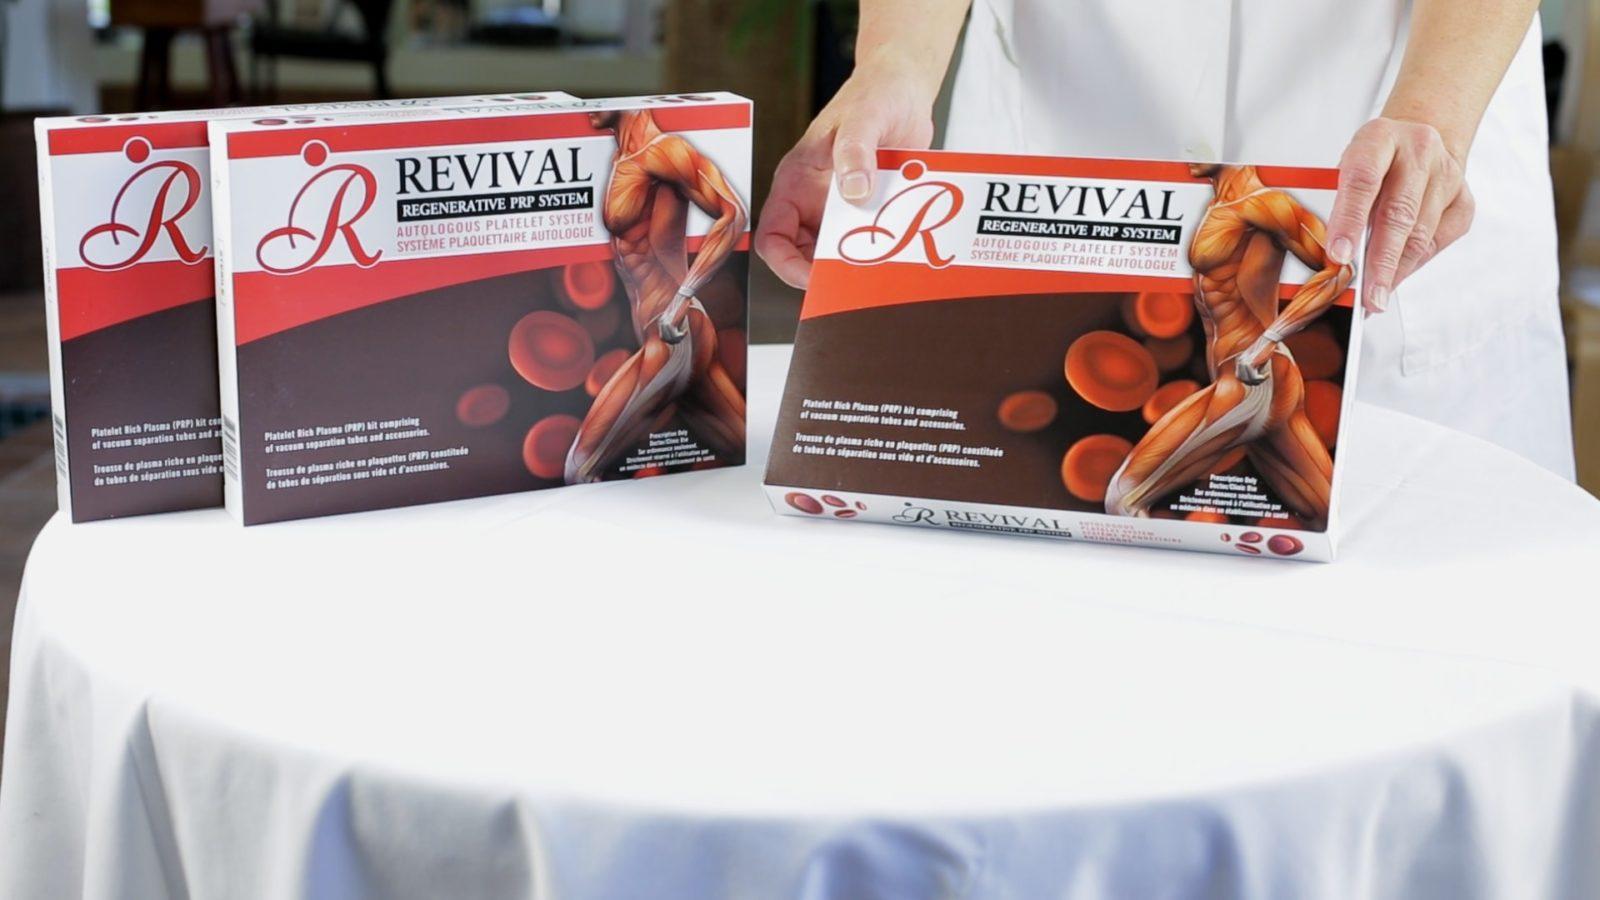 REVIVAL PRP® for Hair Restoration - Xediton Pharmaceuticals